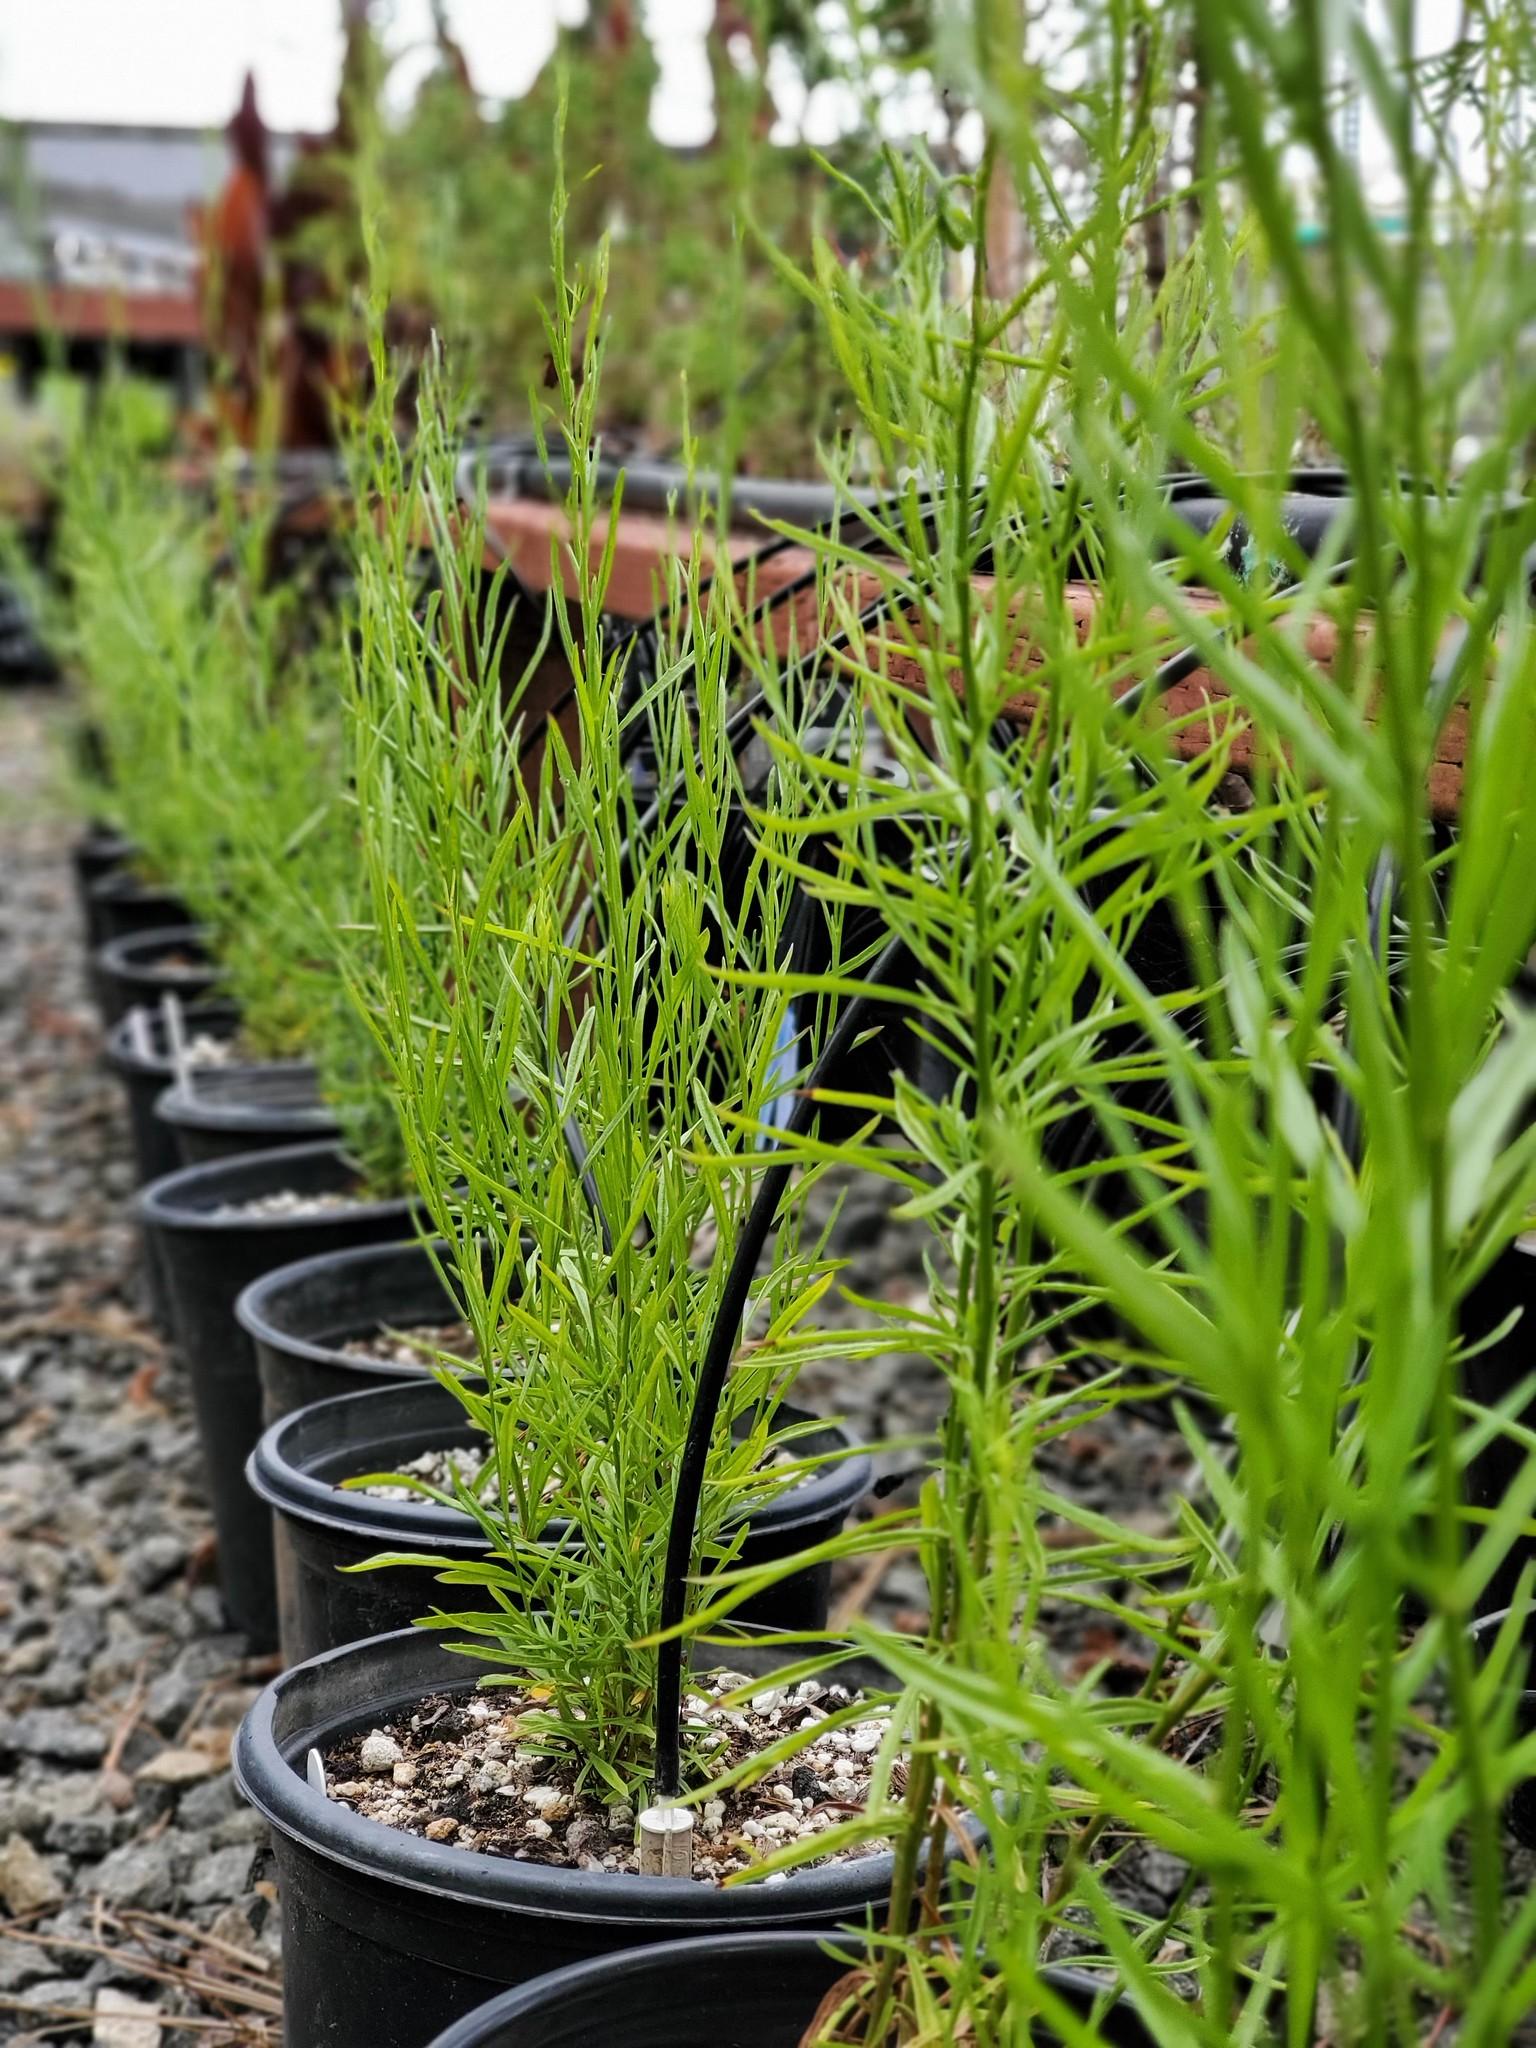 Image of dozens of wild sourced, endangered Encinitas Baccharis flourishing in the San Diego Botanic Garden's nursery. Credit: Tony Gurnoe